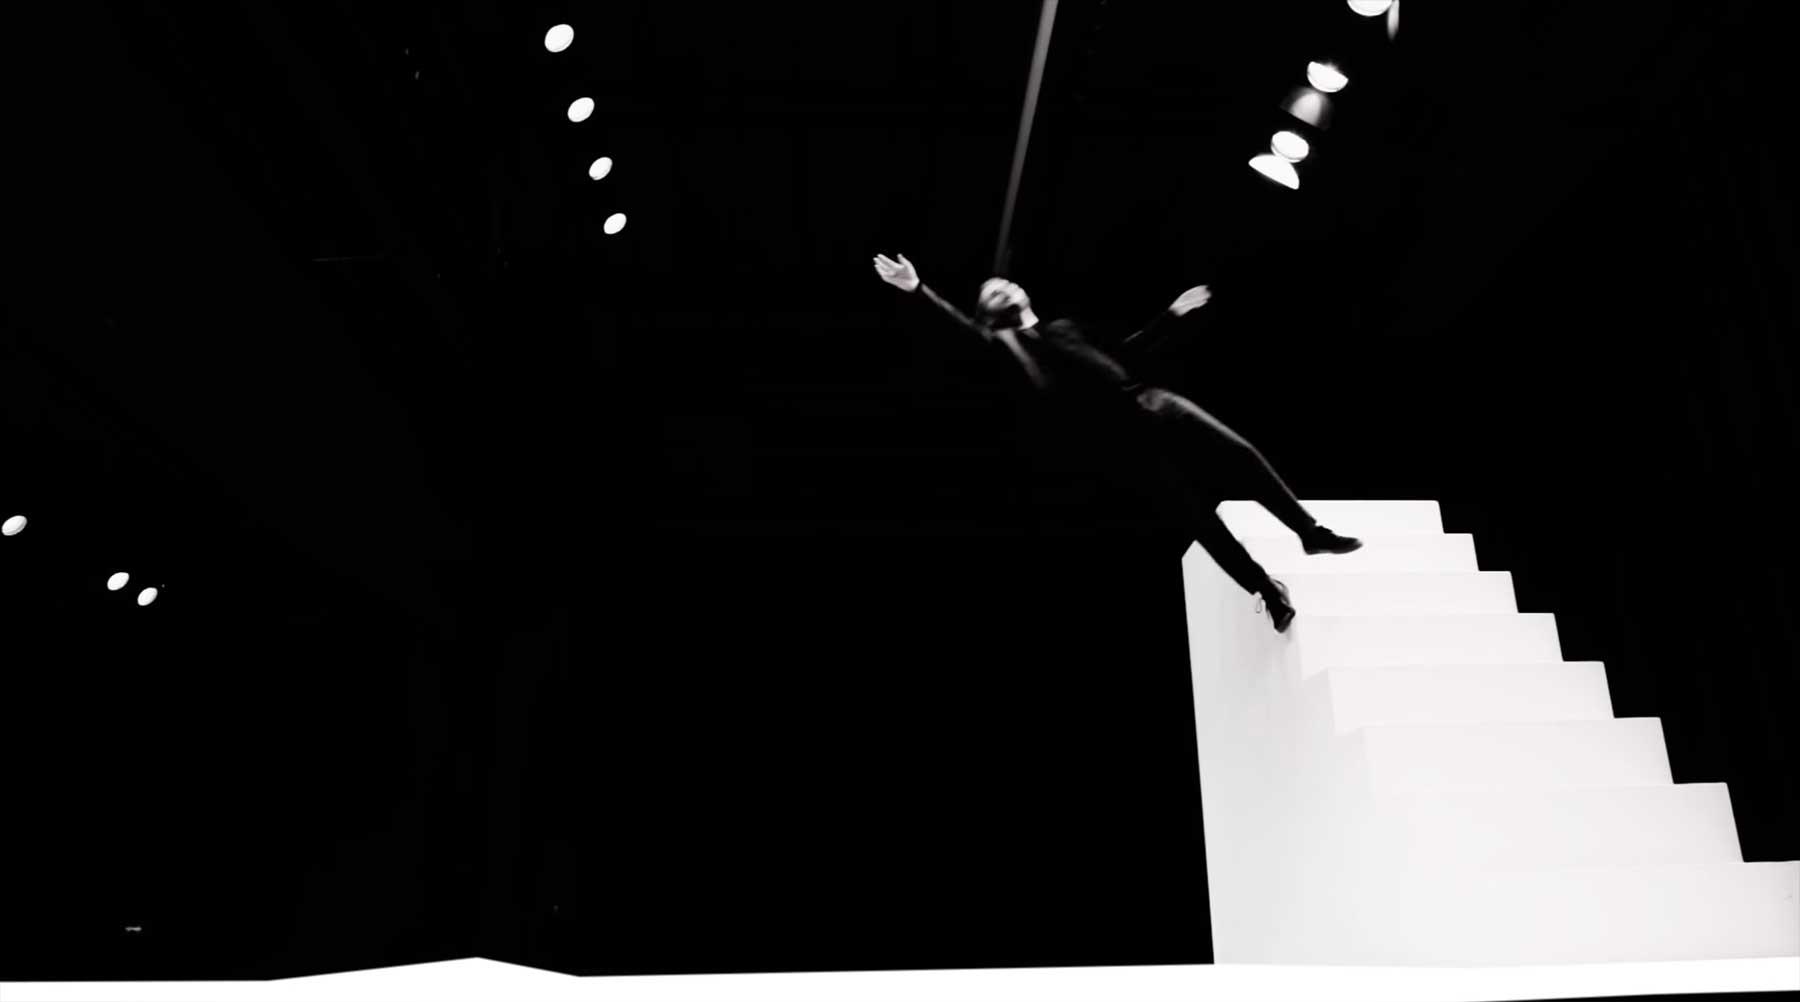 Magischer Trampolin-Treppen-Tanz Clair-de-lune-Debussy-Alexandre-Tharaud-Yoann-Bourgeois_piano-dance